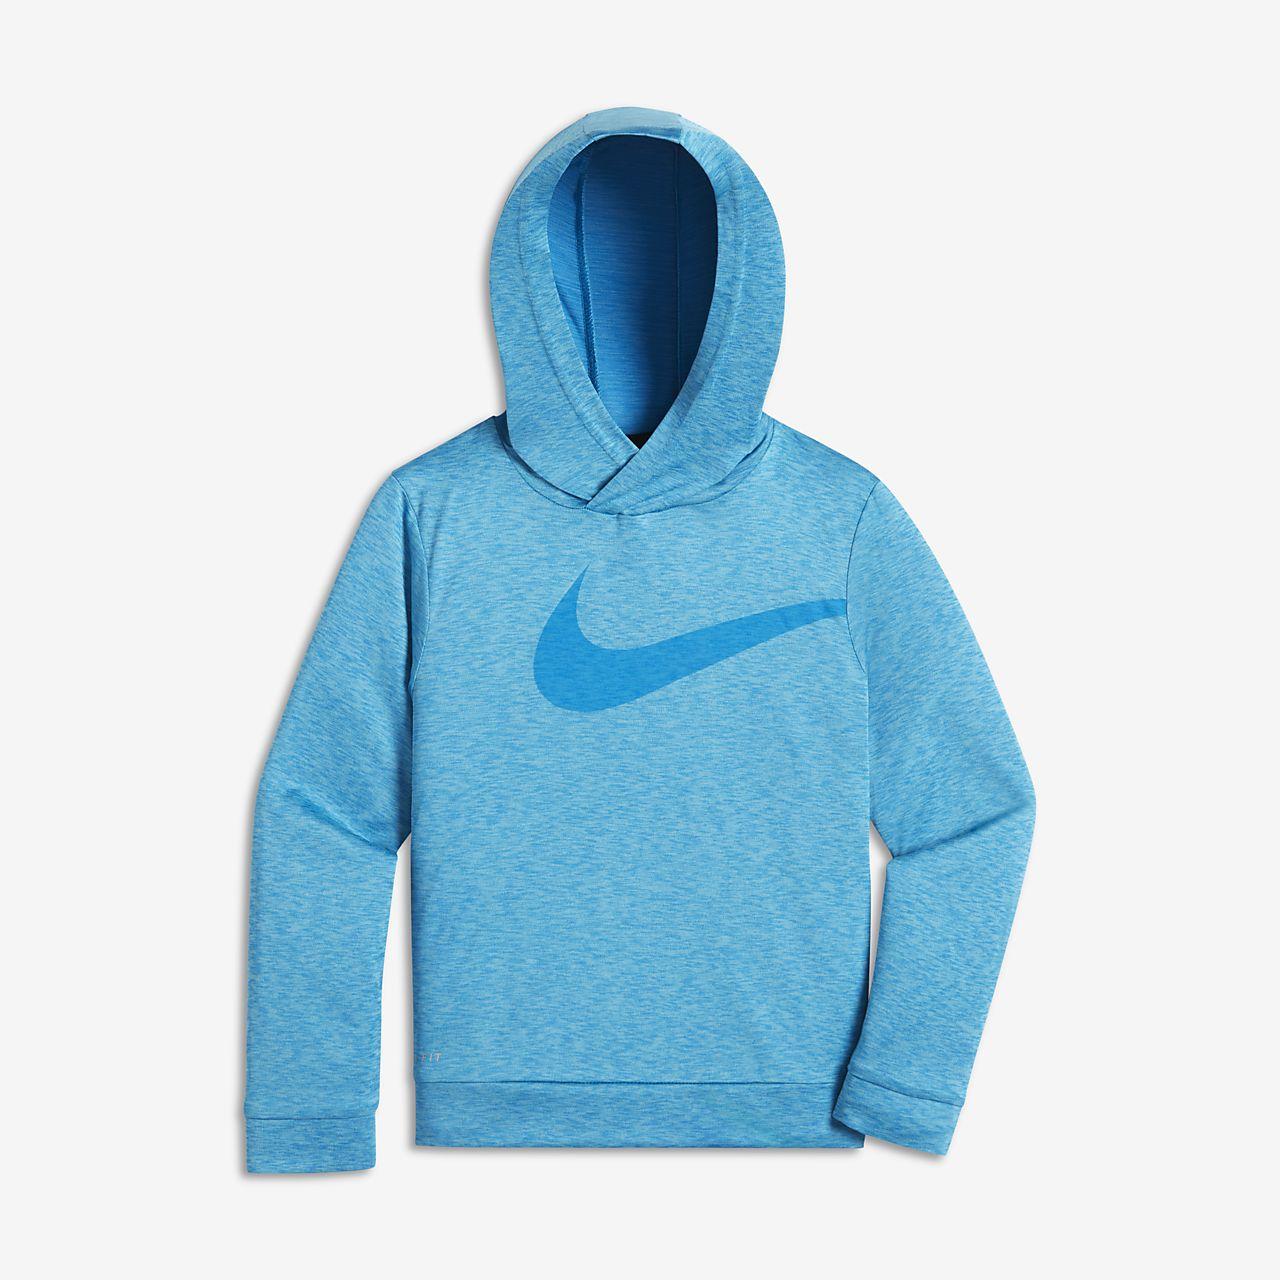 Nike Dry Swoosh kapucnis pulóver gyerekeknek (fiúk)